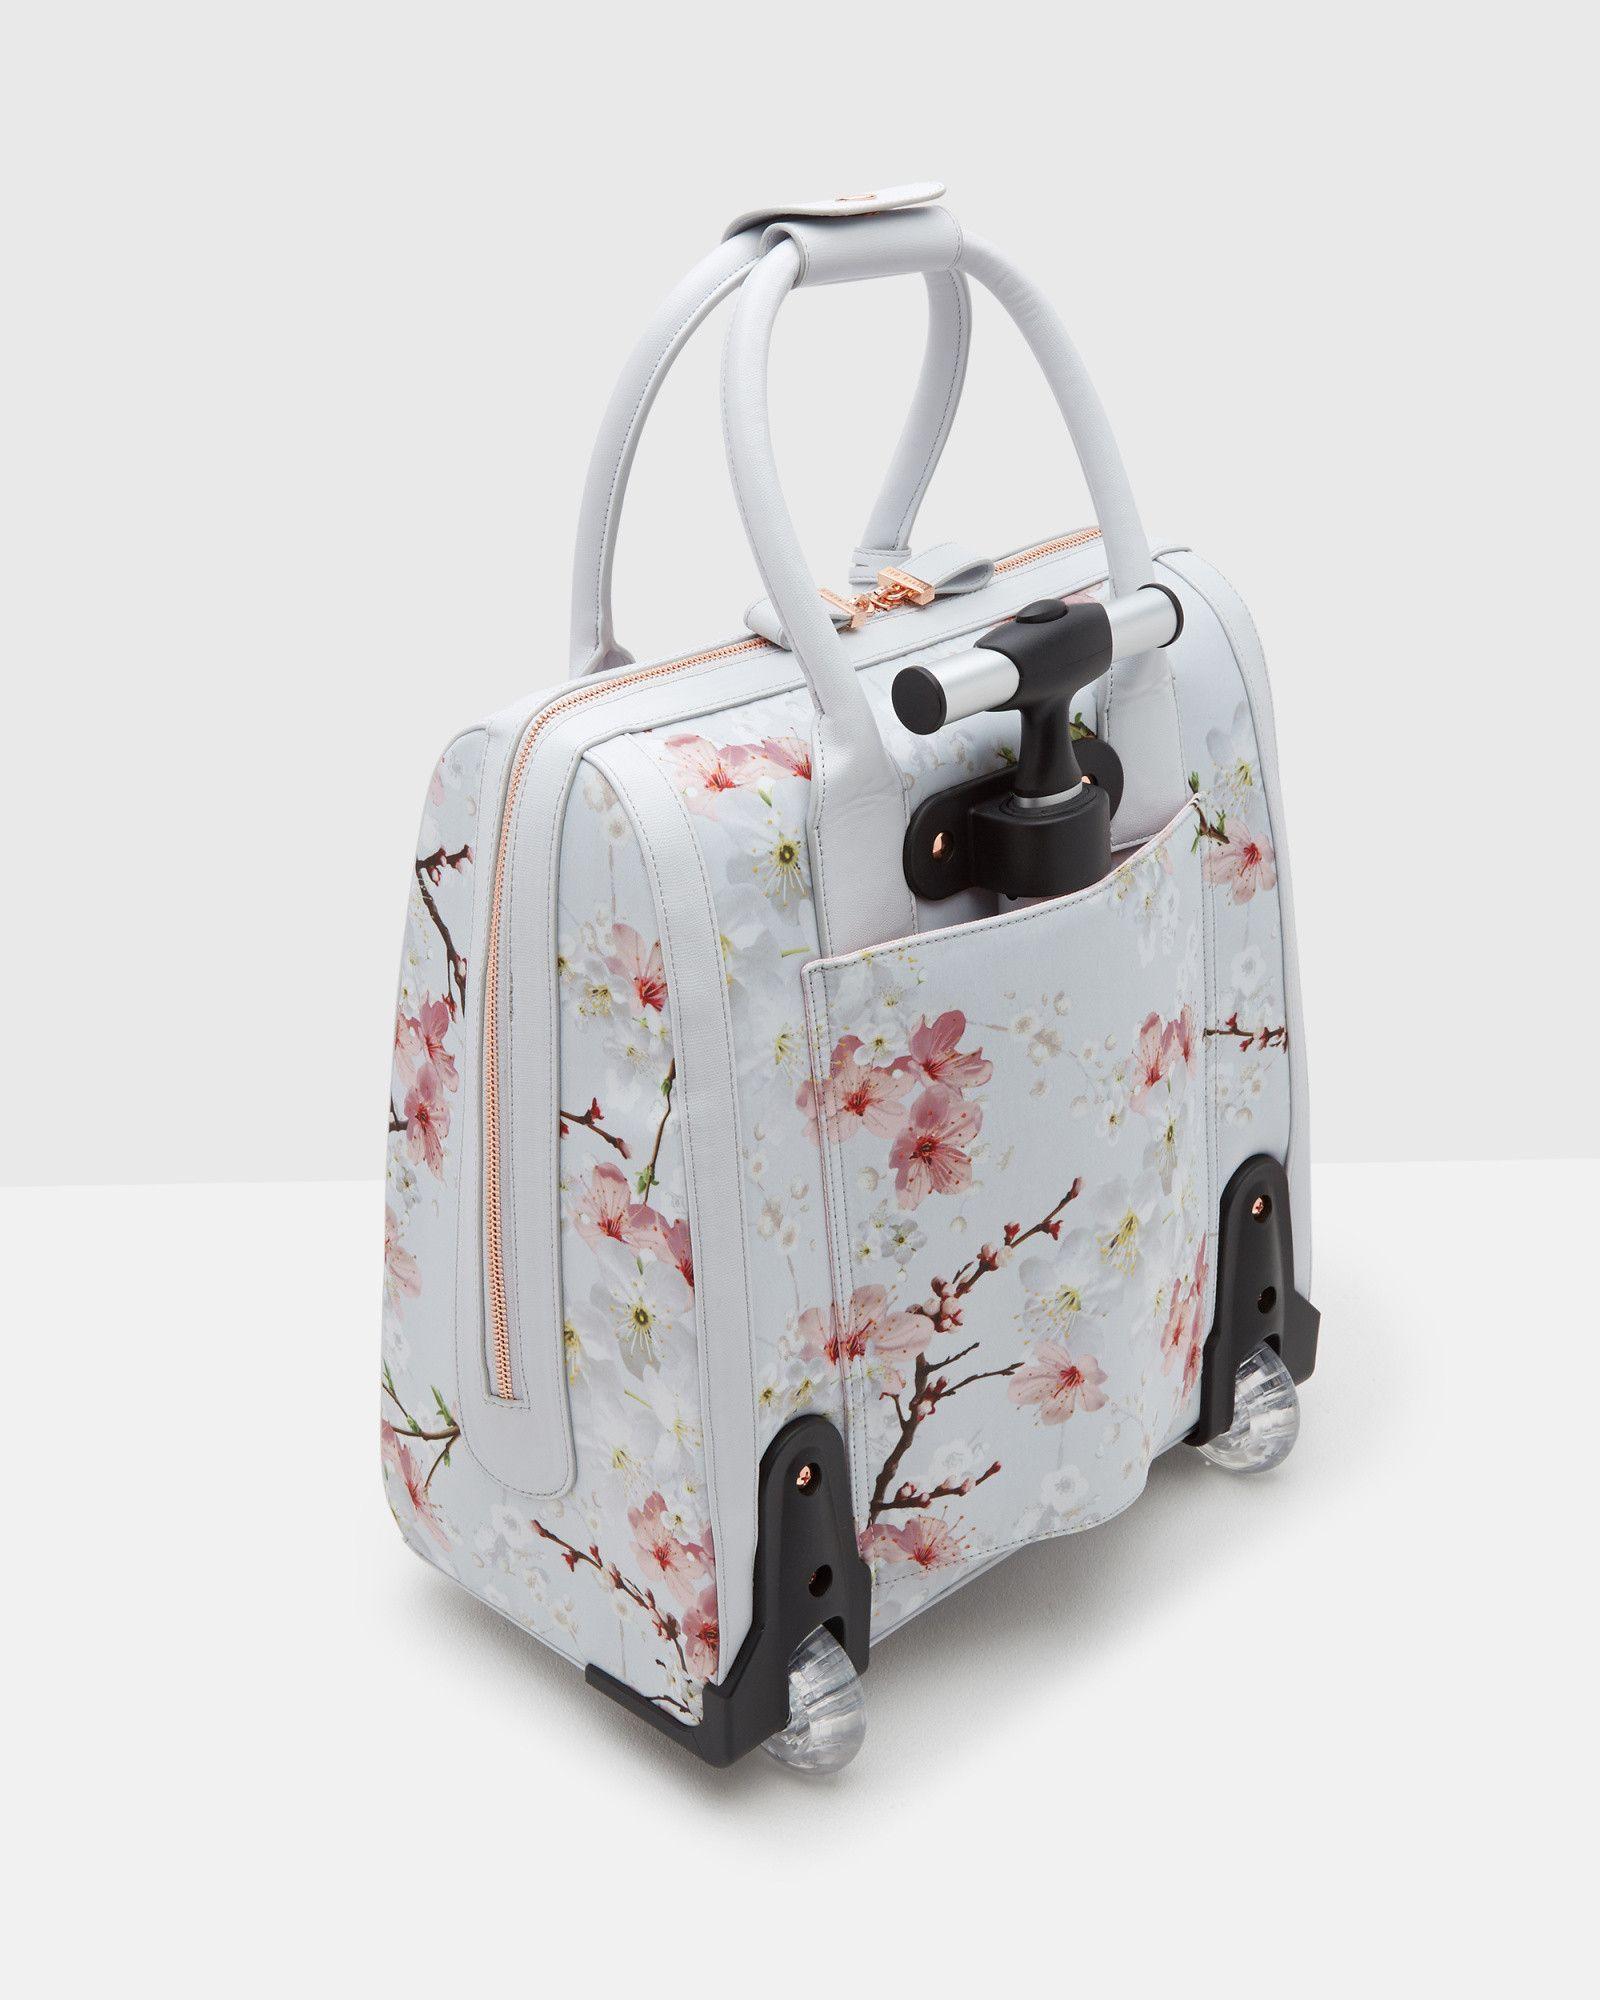 89d720fff Oriental Blossom travel bag - Light Gray   Bags   Ted Baker   Home ...